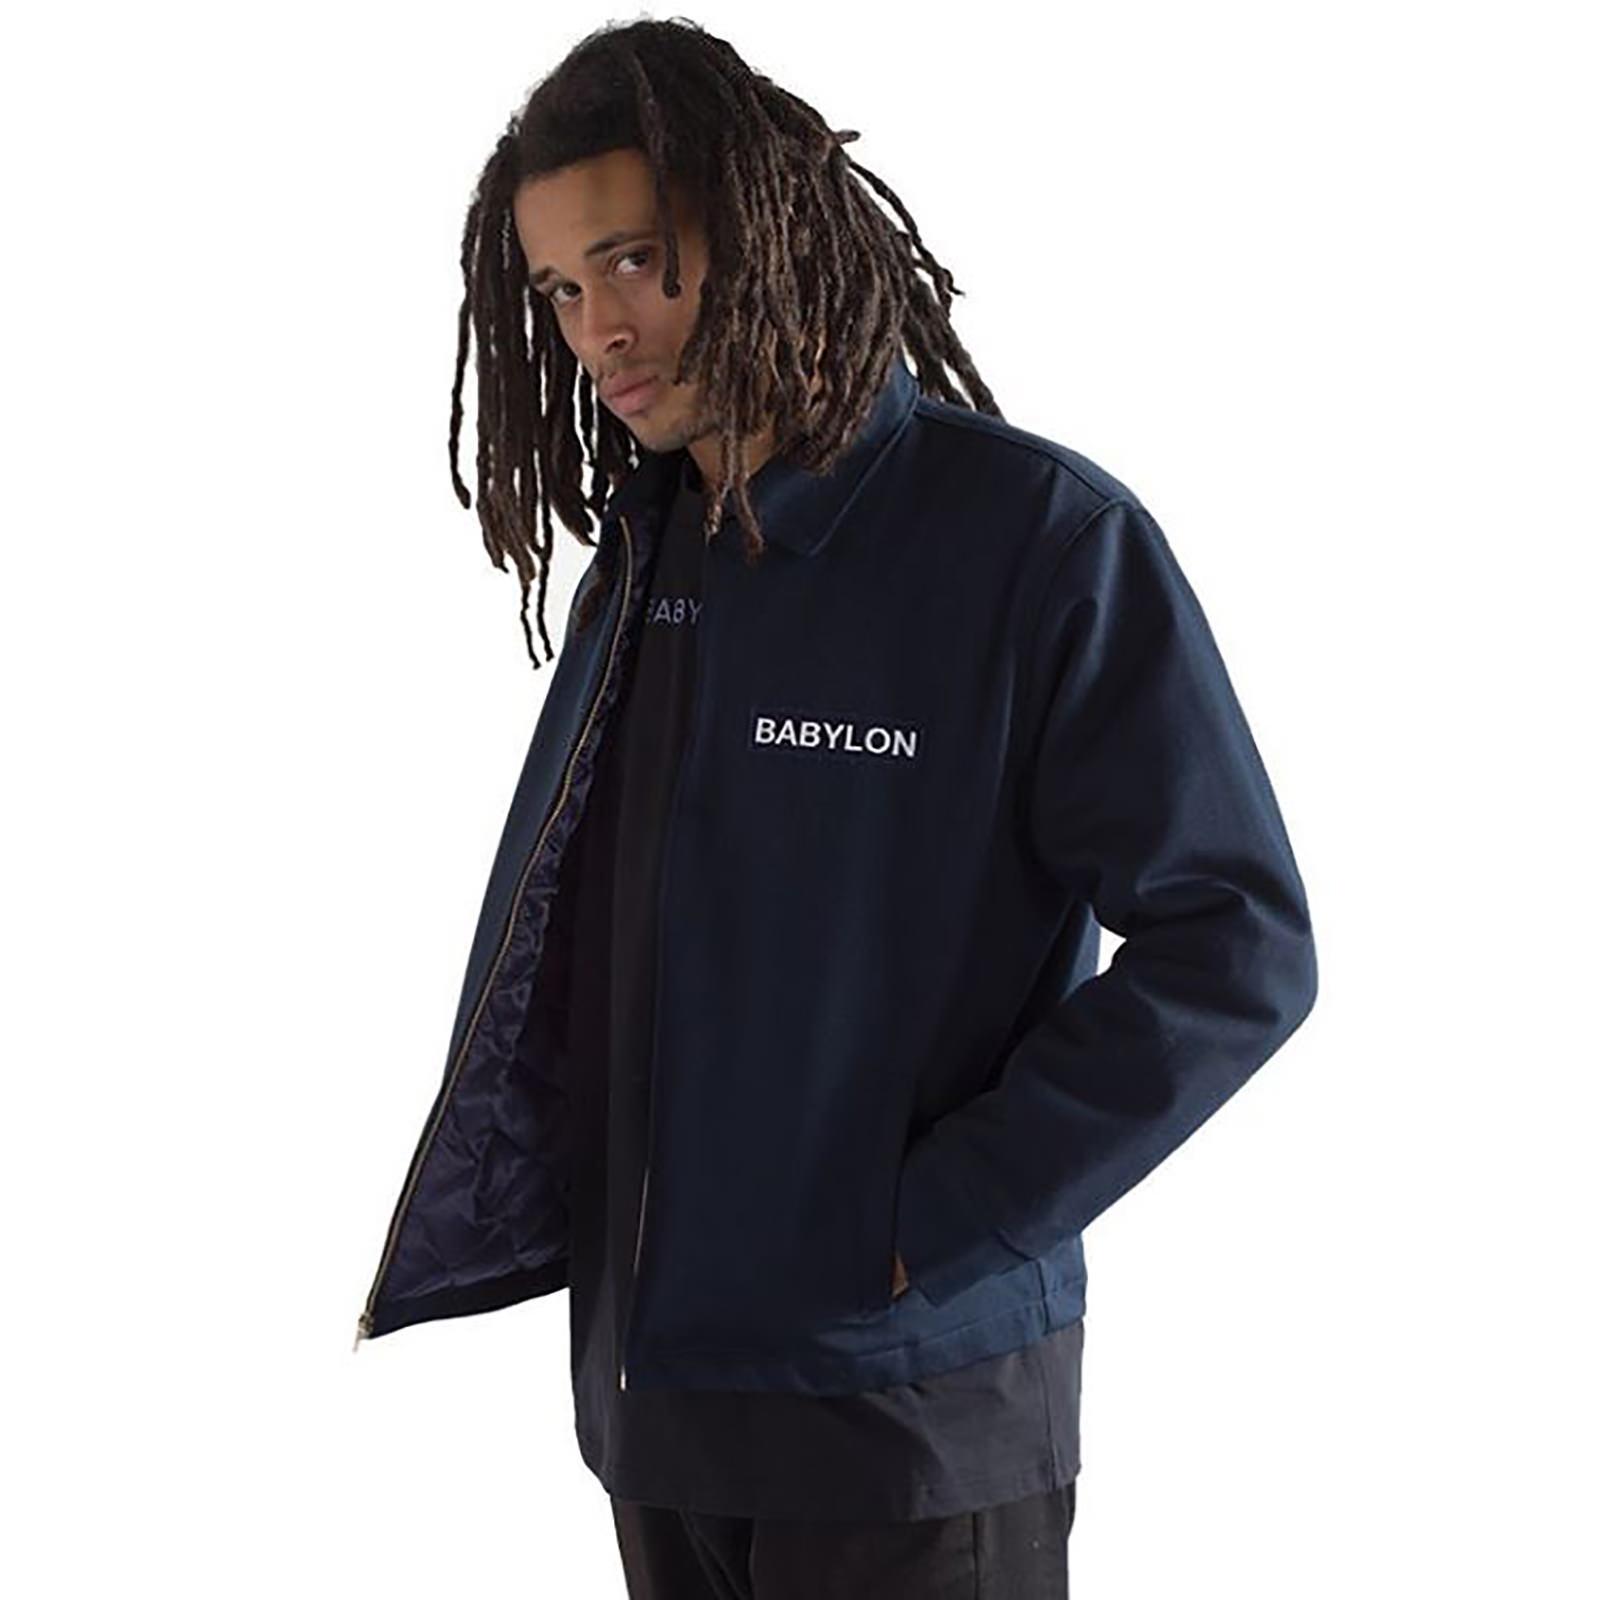 582d3b70ac1688d44b9d9baf_babylon-under-fire-jacket-04